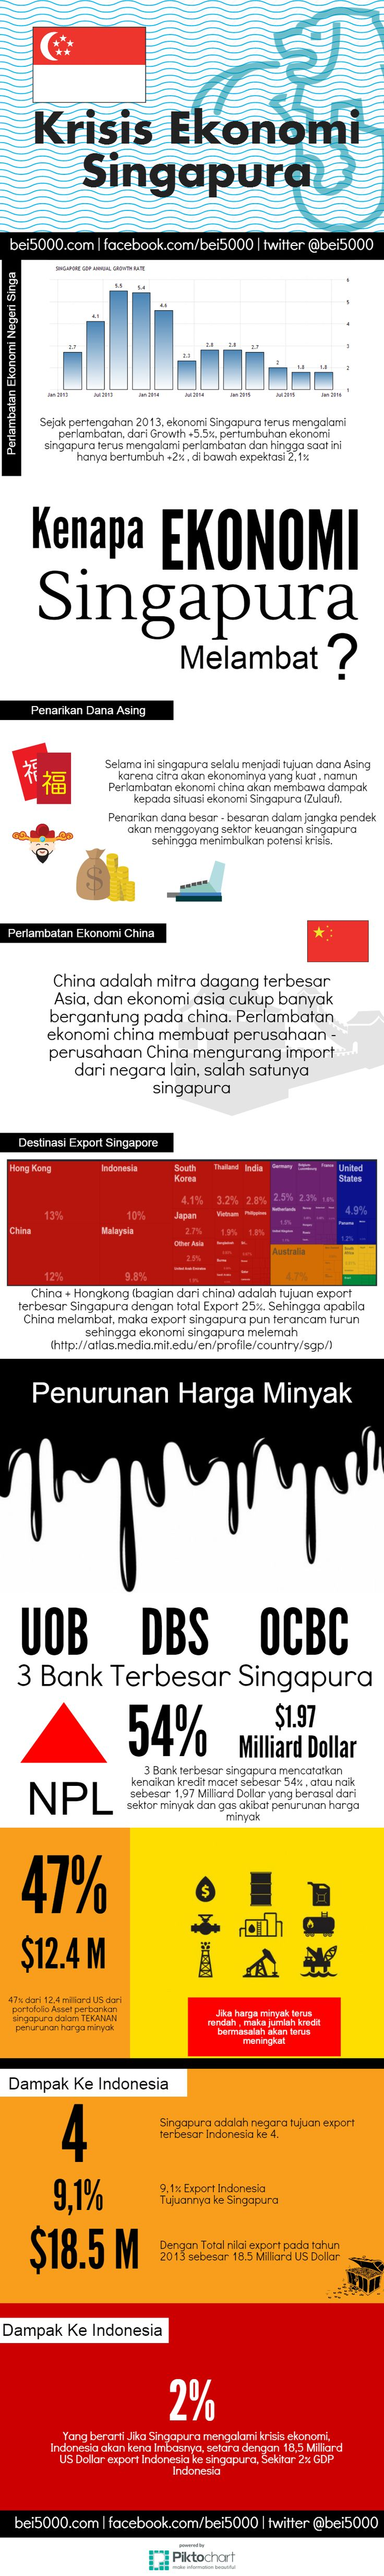 Infografis kris ekonomi singapura